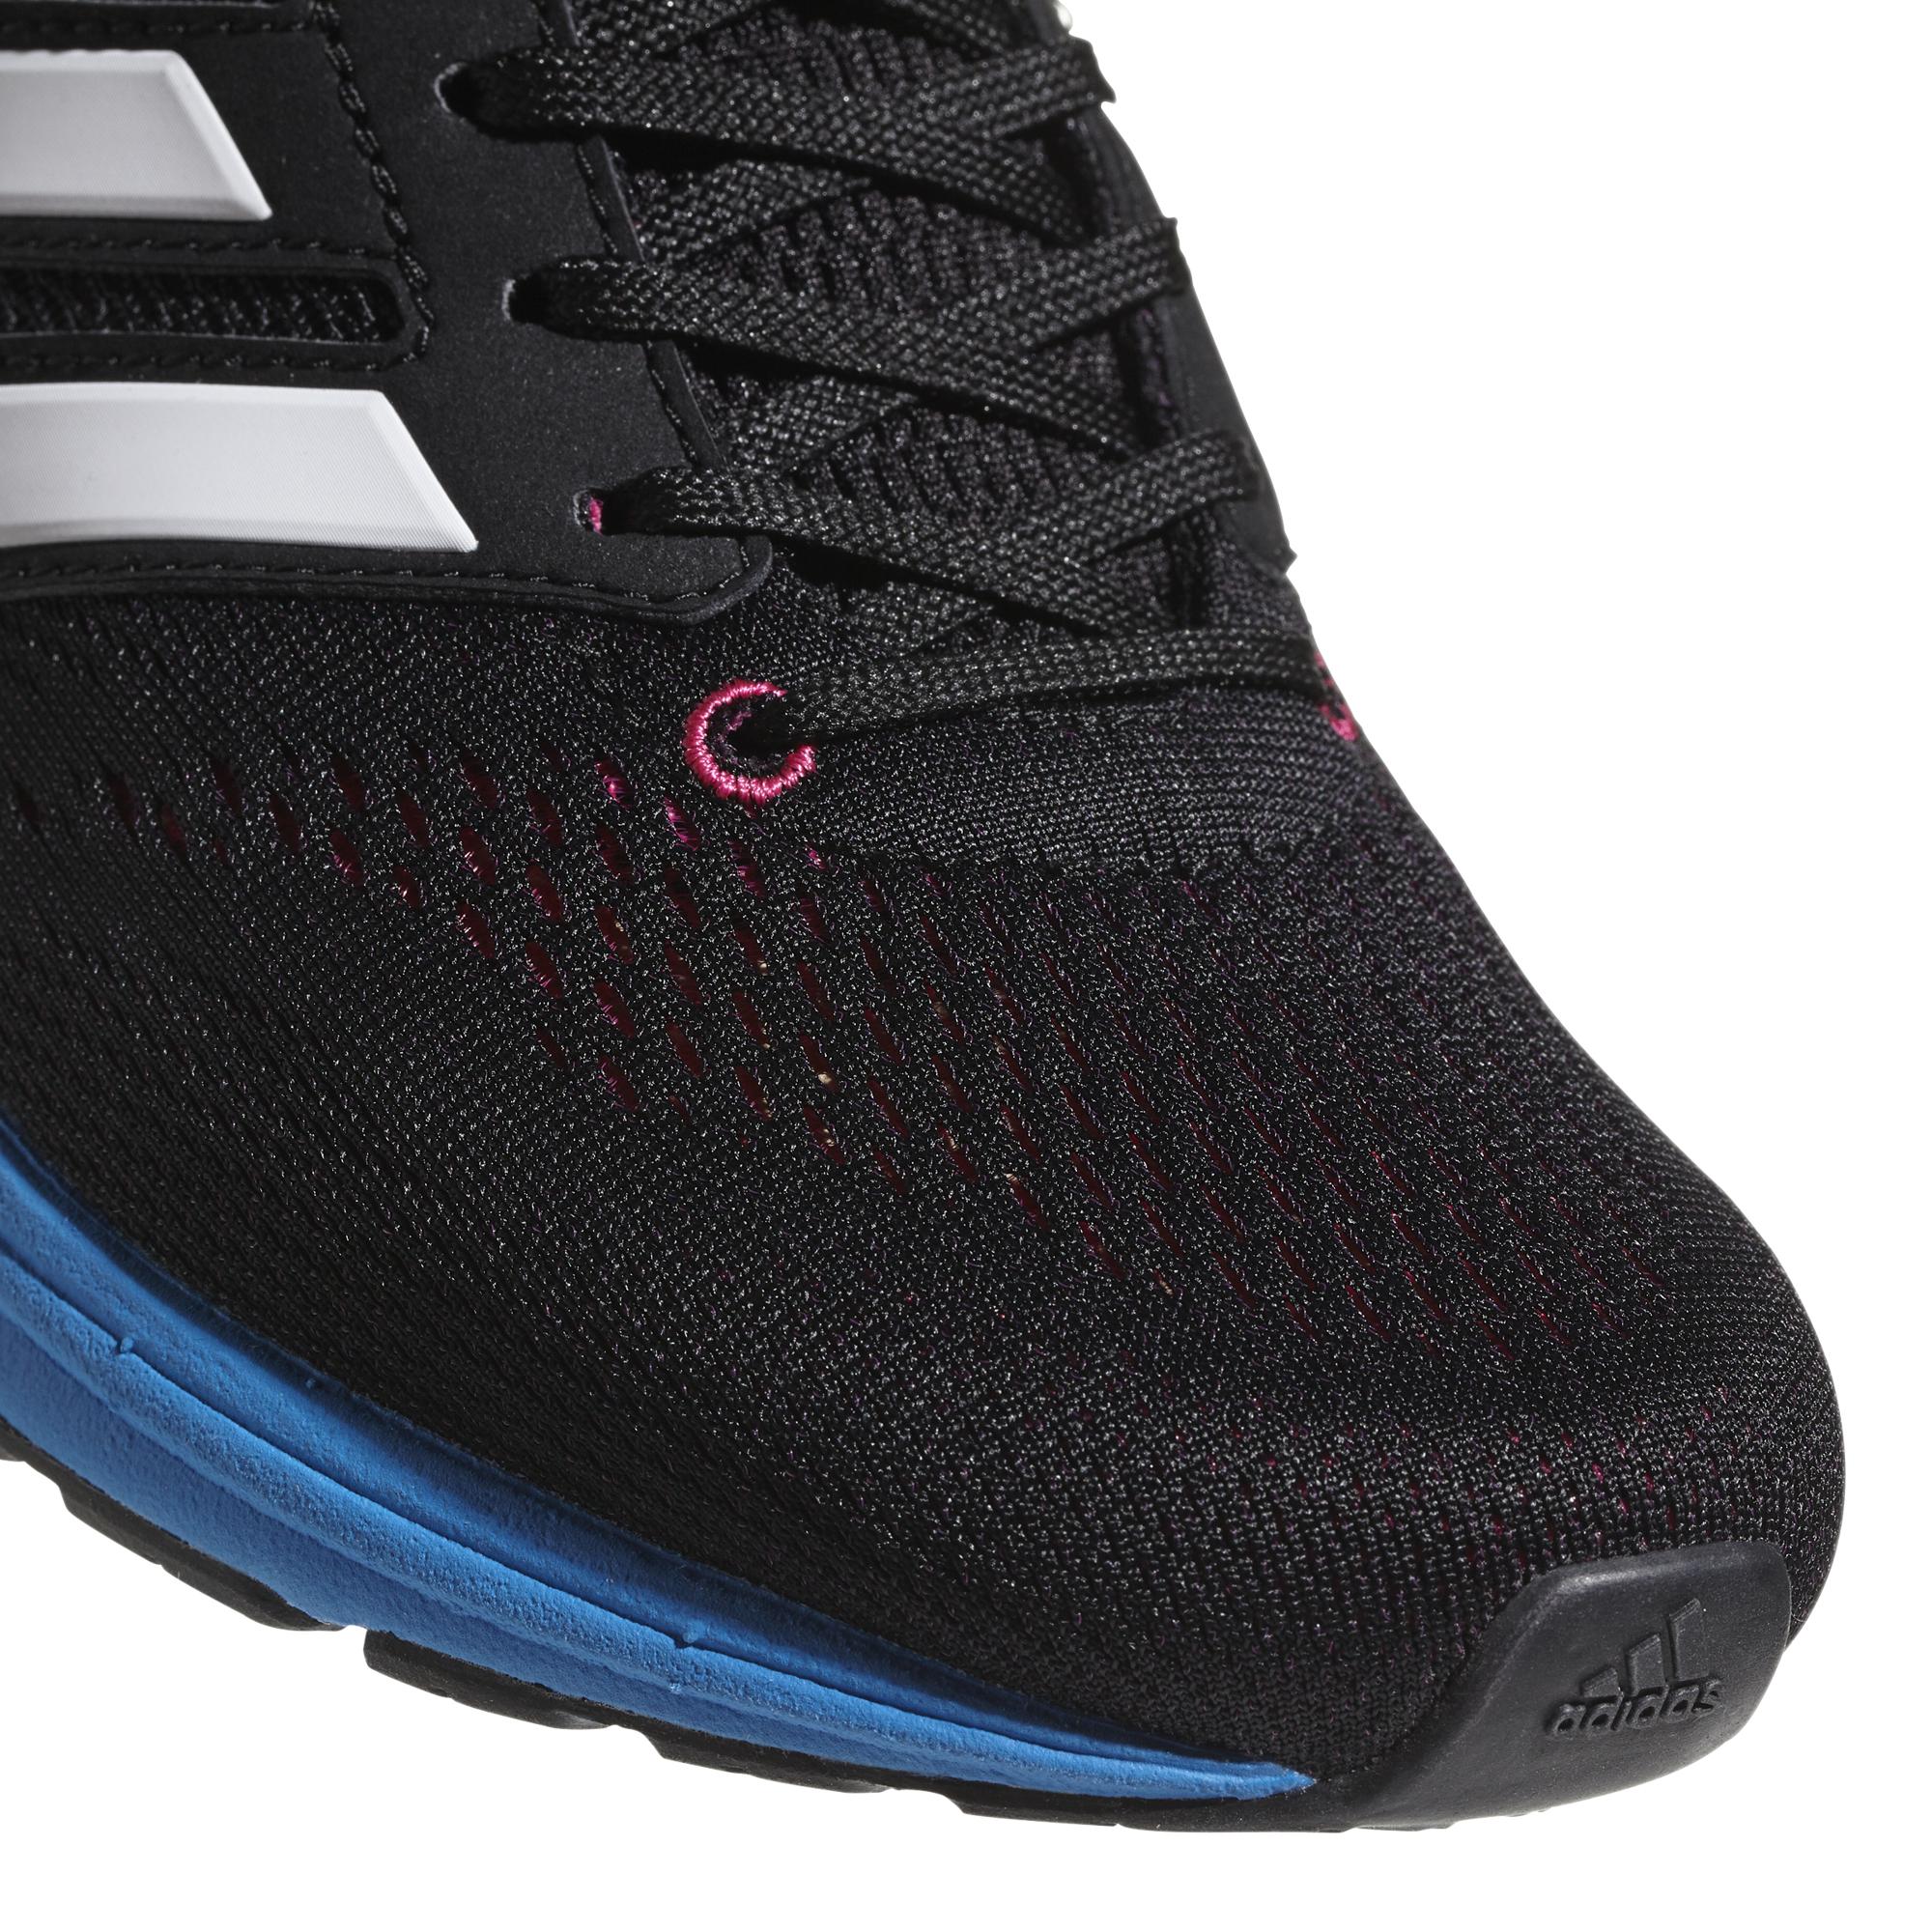 Adidas sko str 38 til kr 600   FINN.no